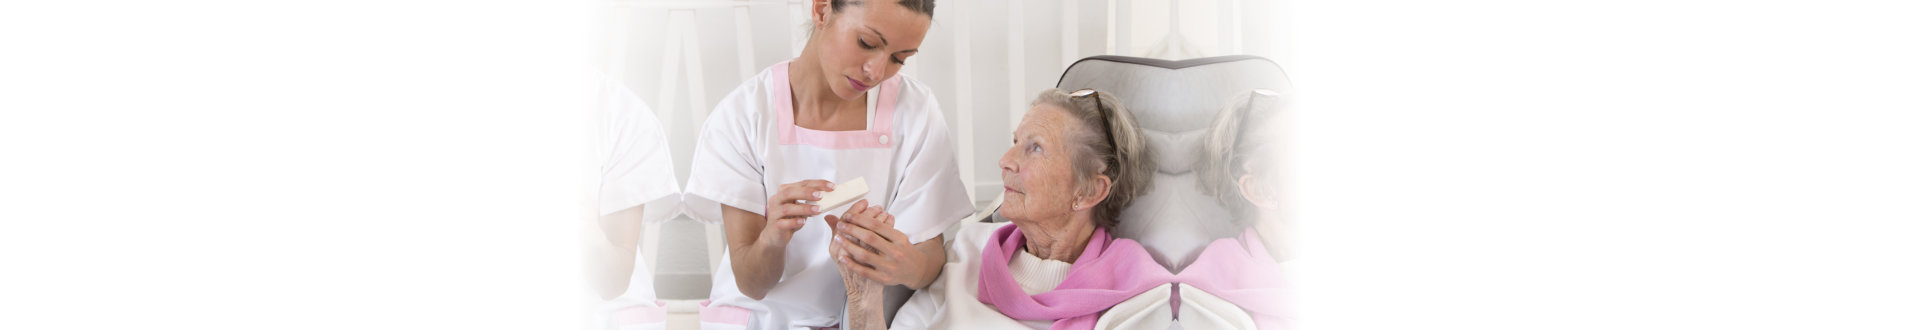 senior women receiving home beauty treatment hand care